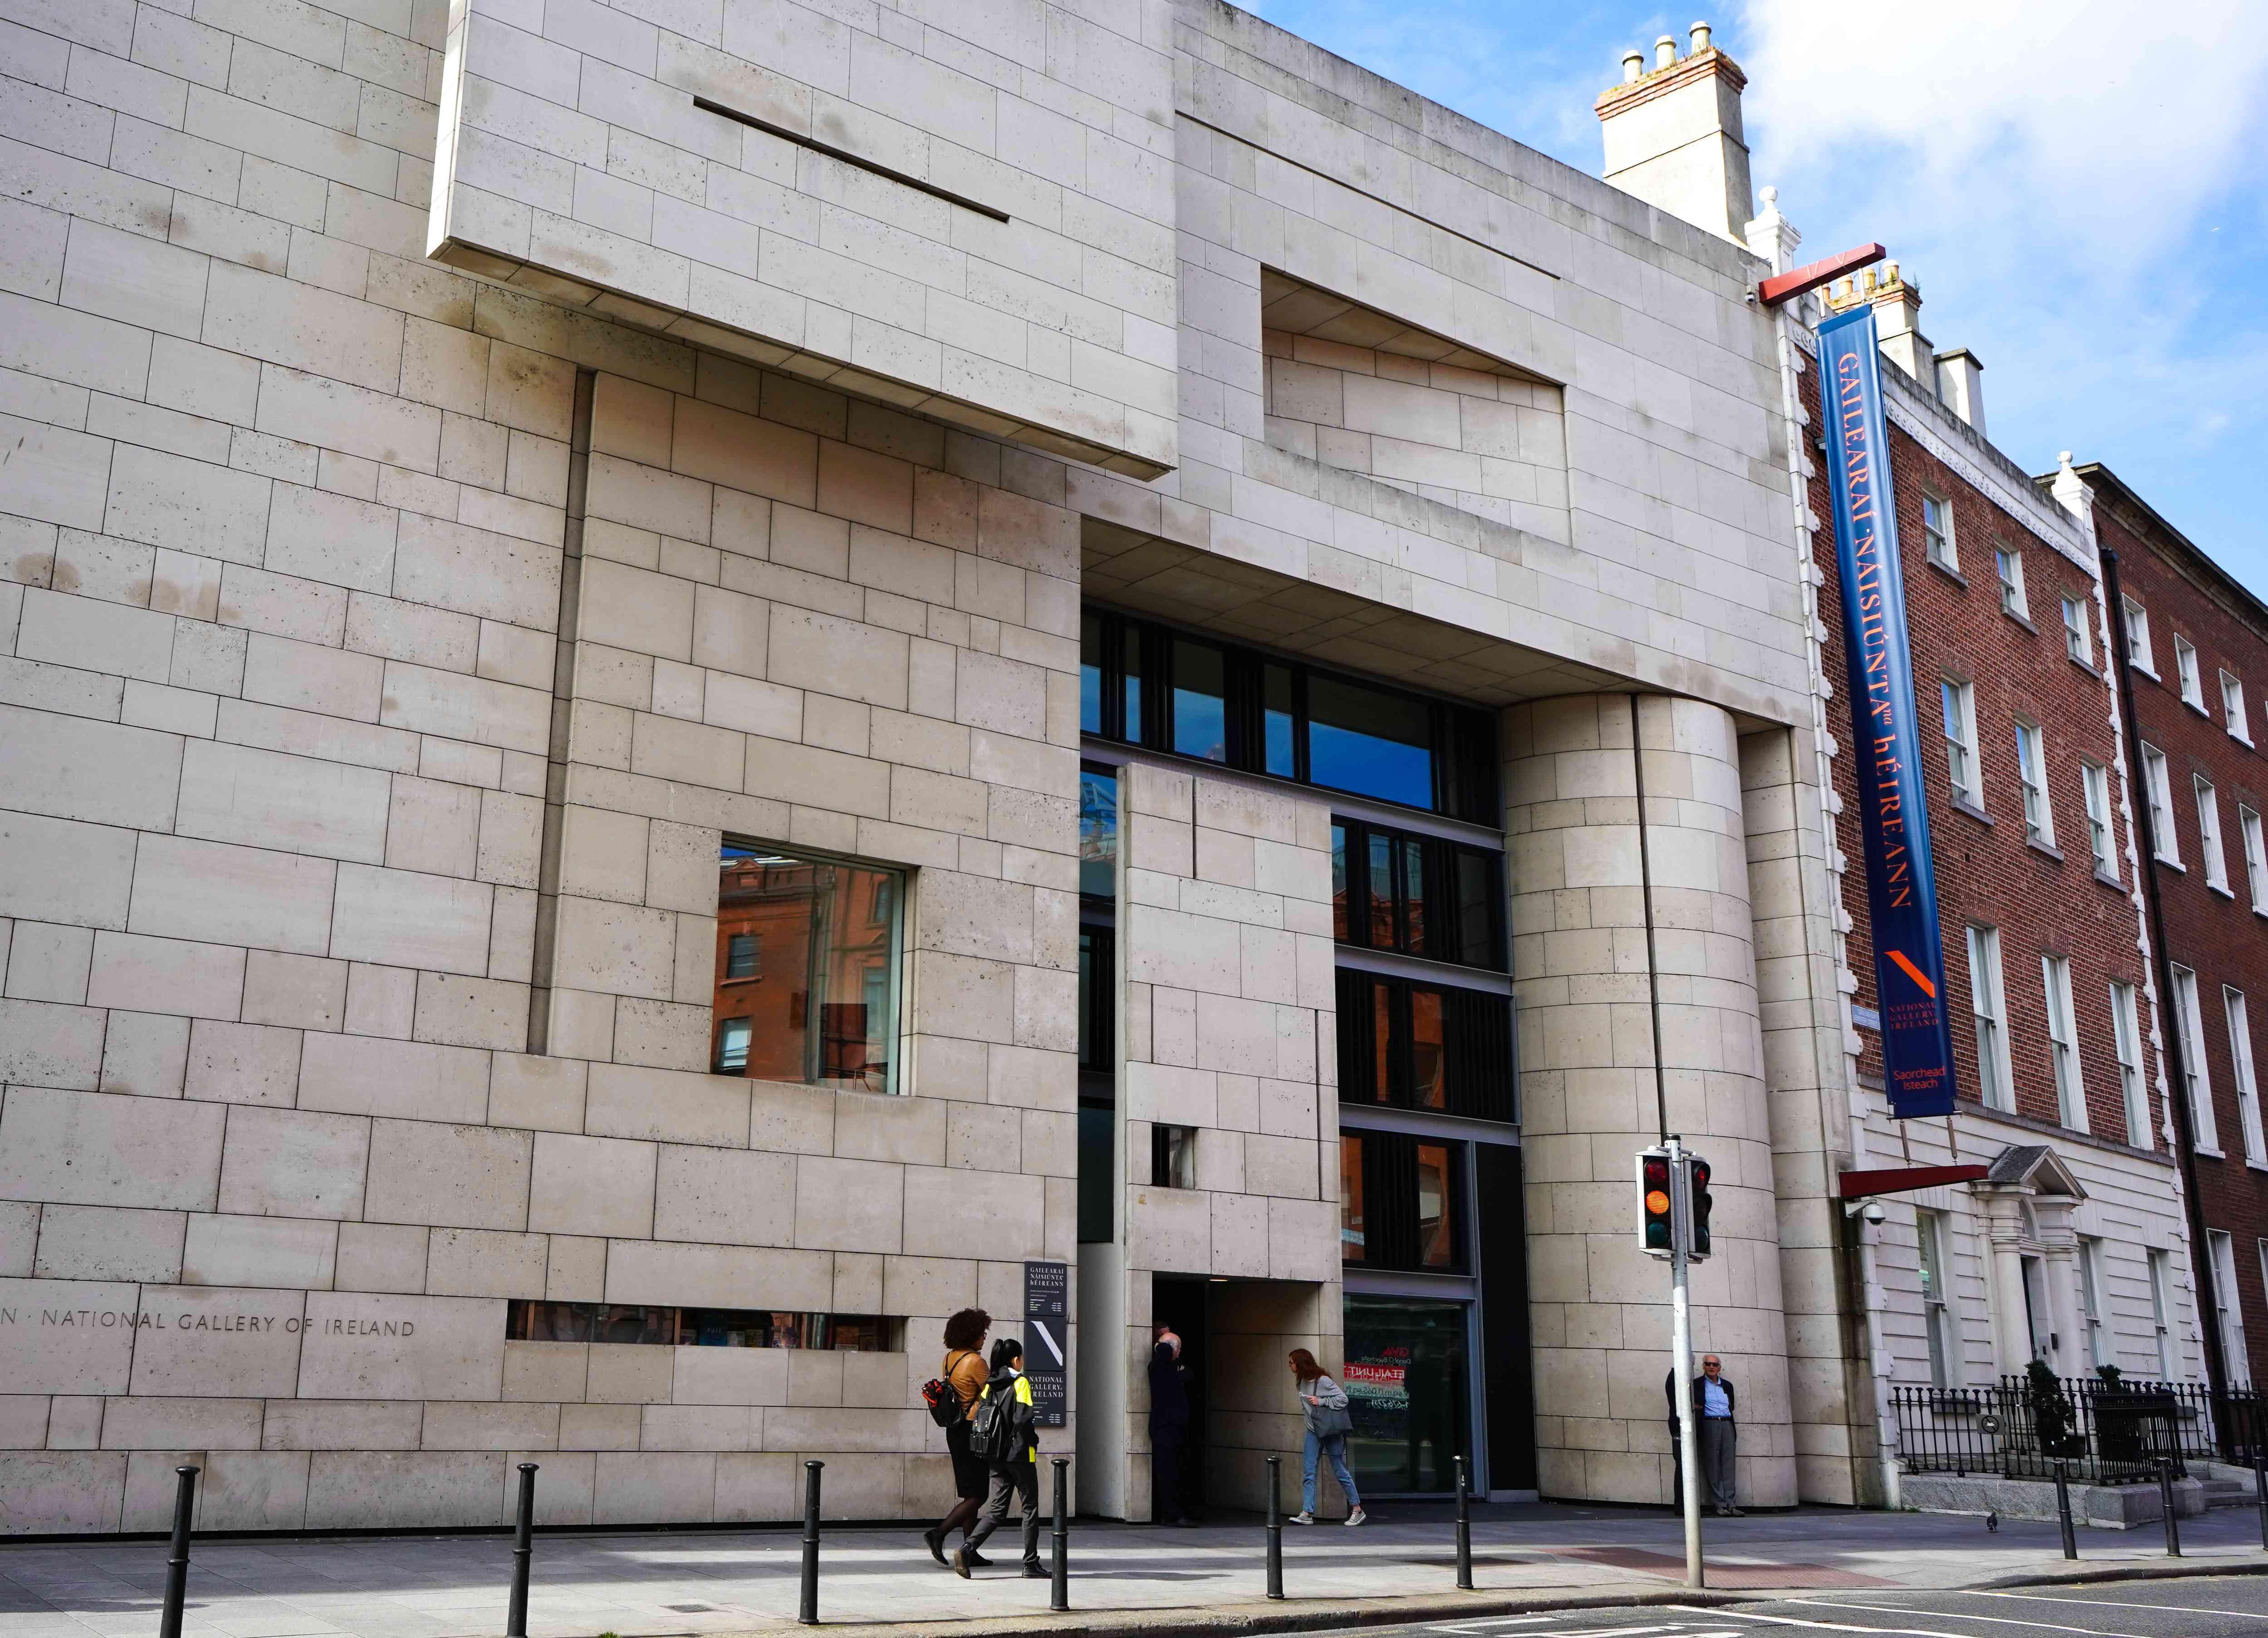 National Gallery of Ireland in Dublin